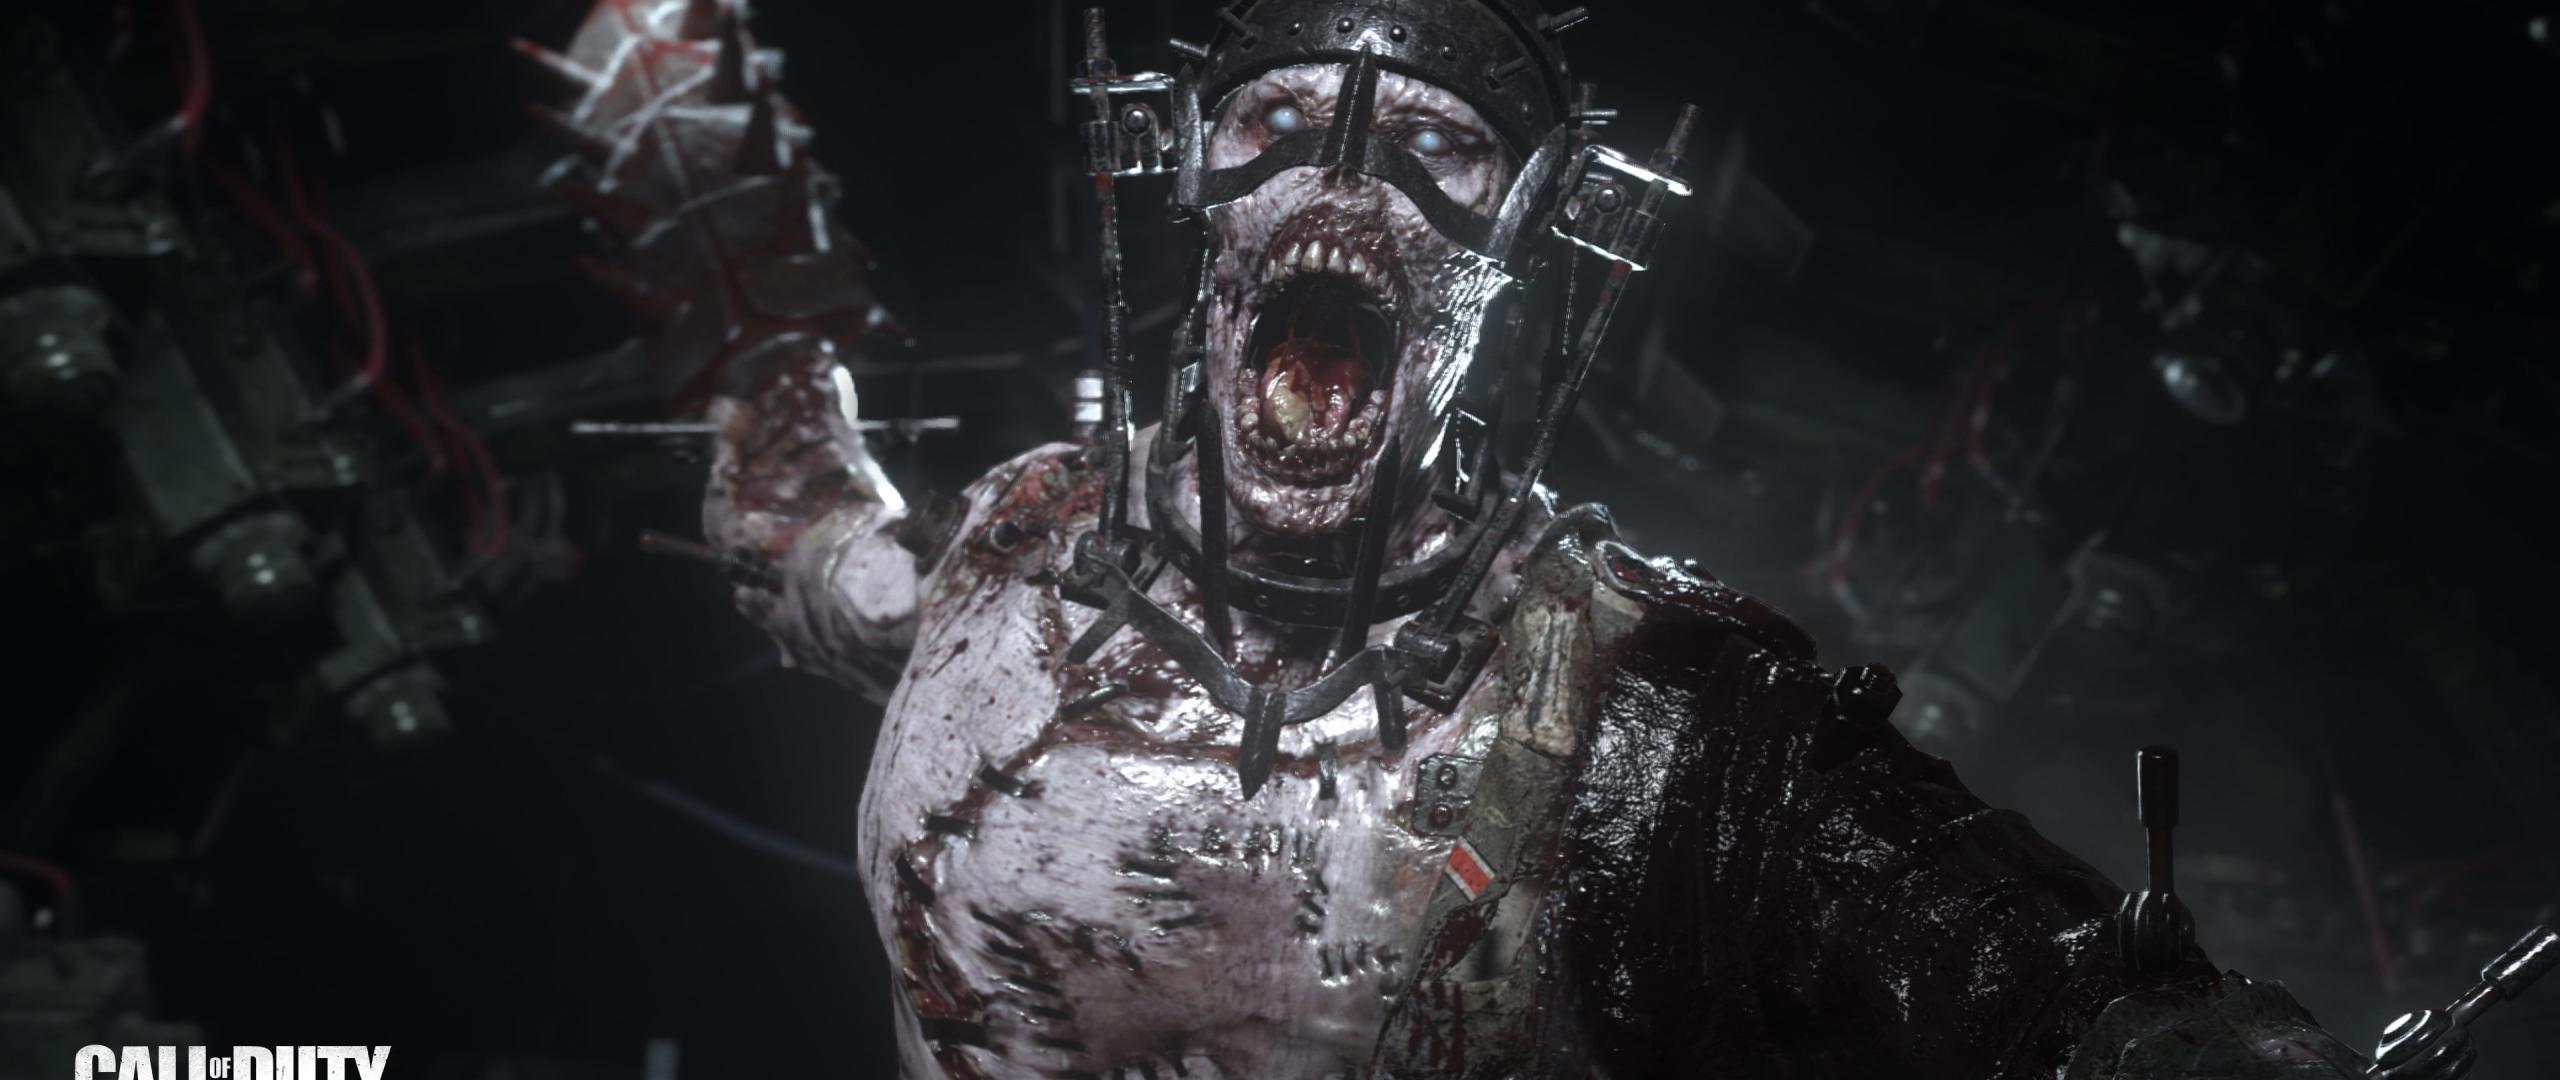 Call Of Duty Ww2 Zombies Wallpaper: Call Of Duty Wwii Nazi Zombies, HD 4K Wallpaper